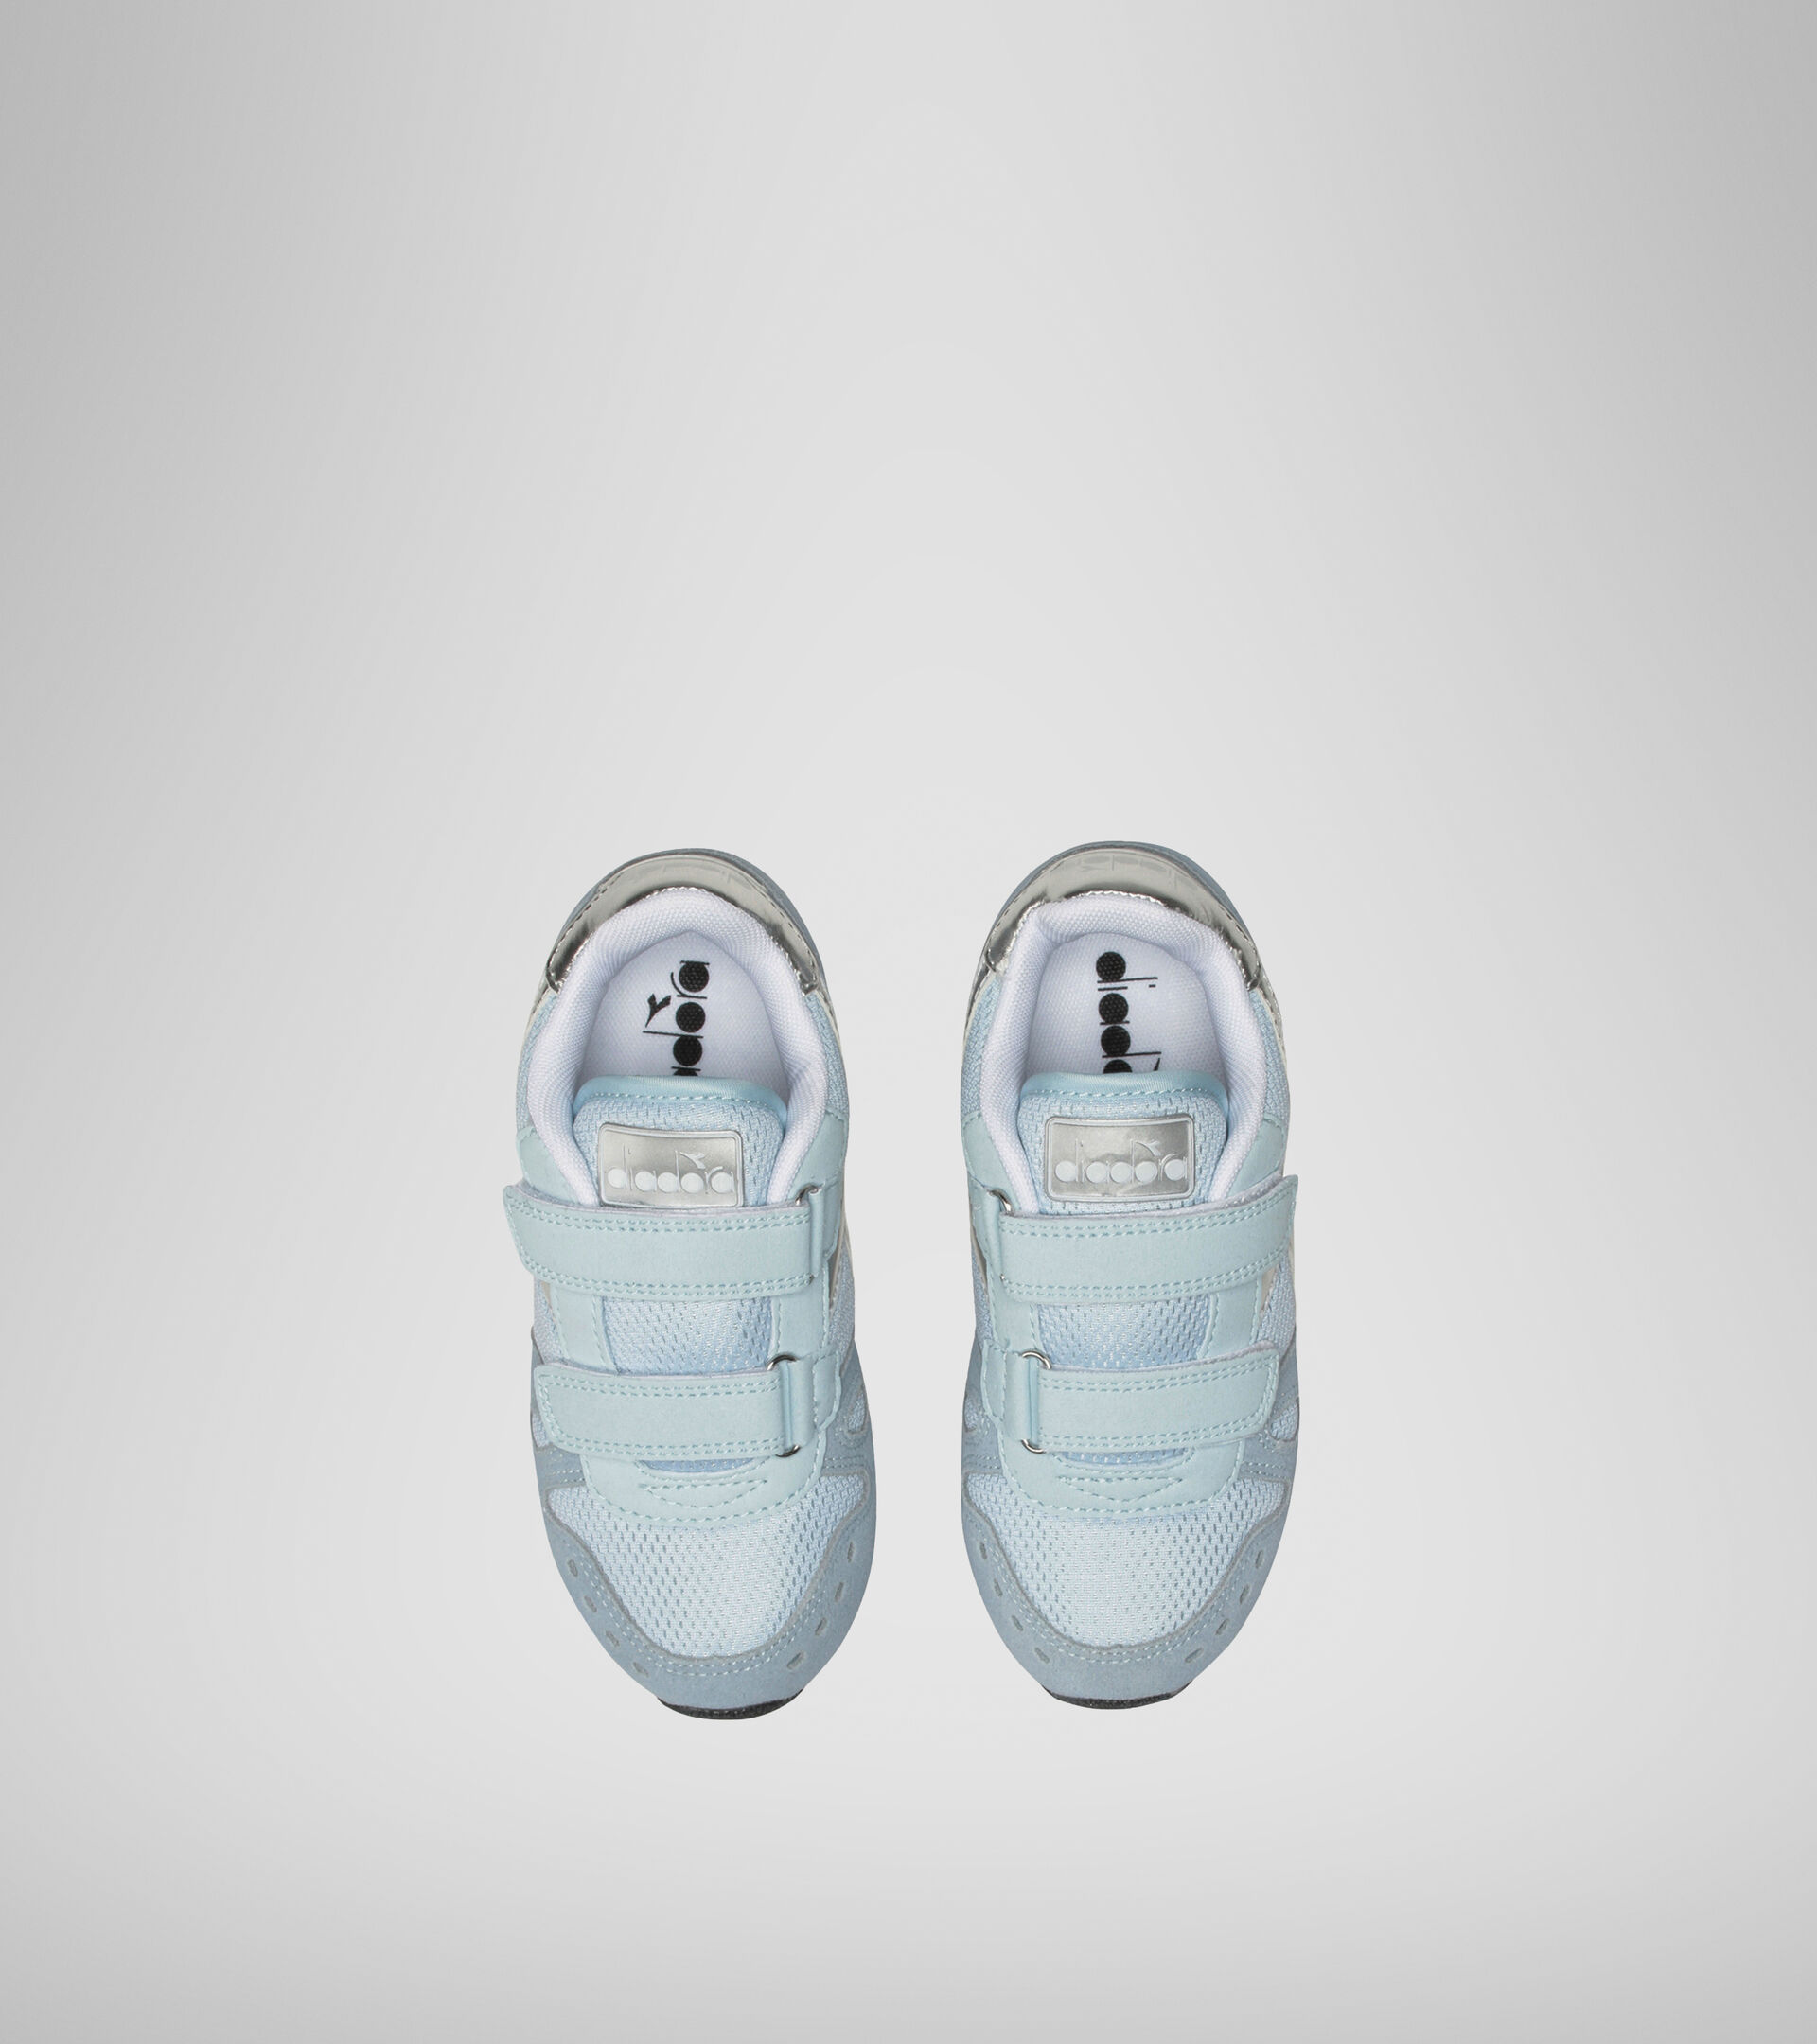 Footwear Sport BAMBINO SIMPLE RUN PS GIRL STARLIGHT BLUE Diadora